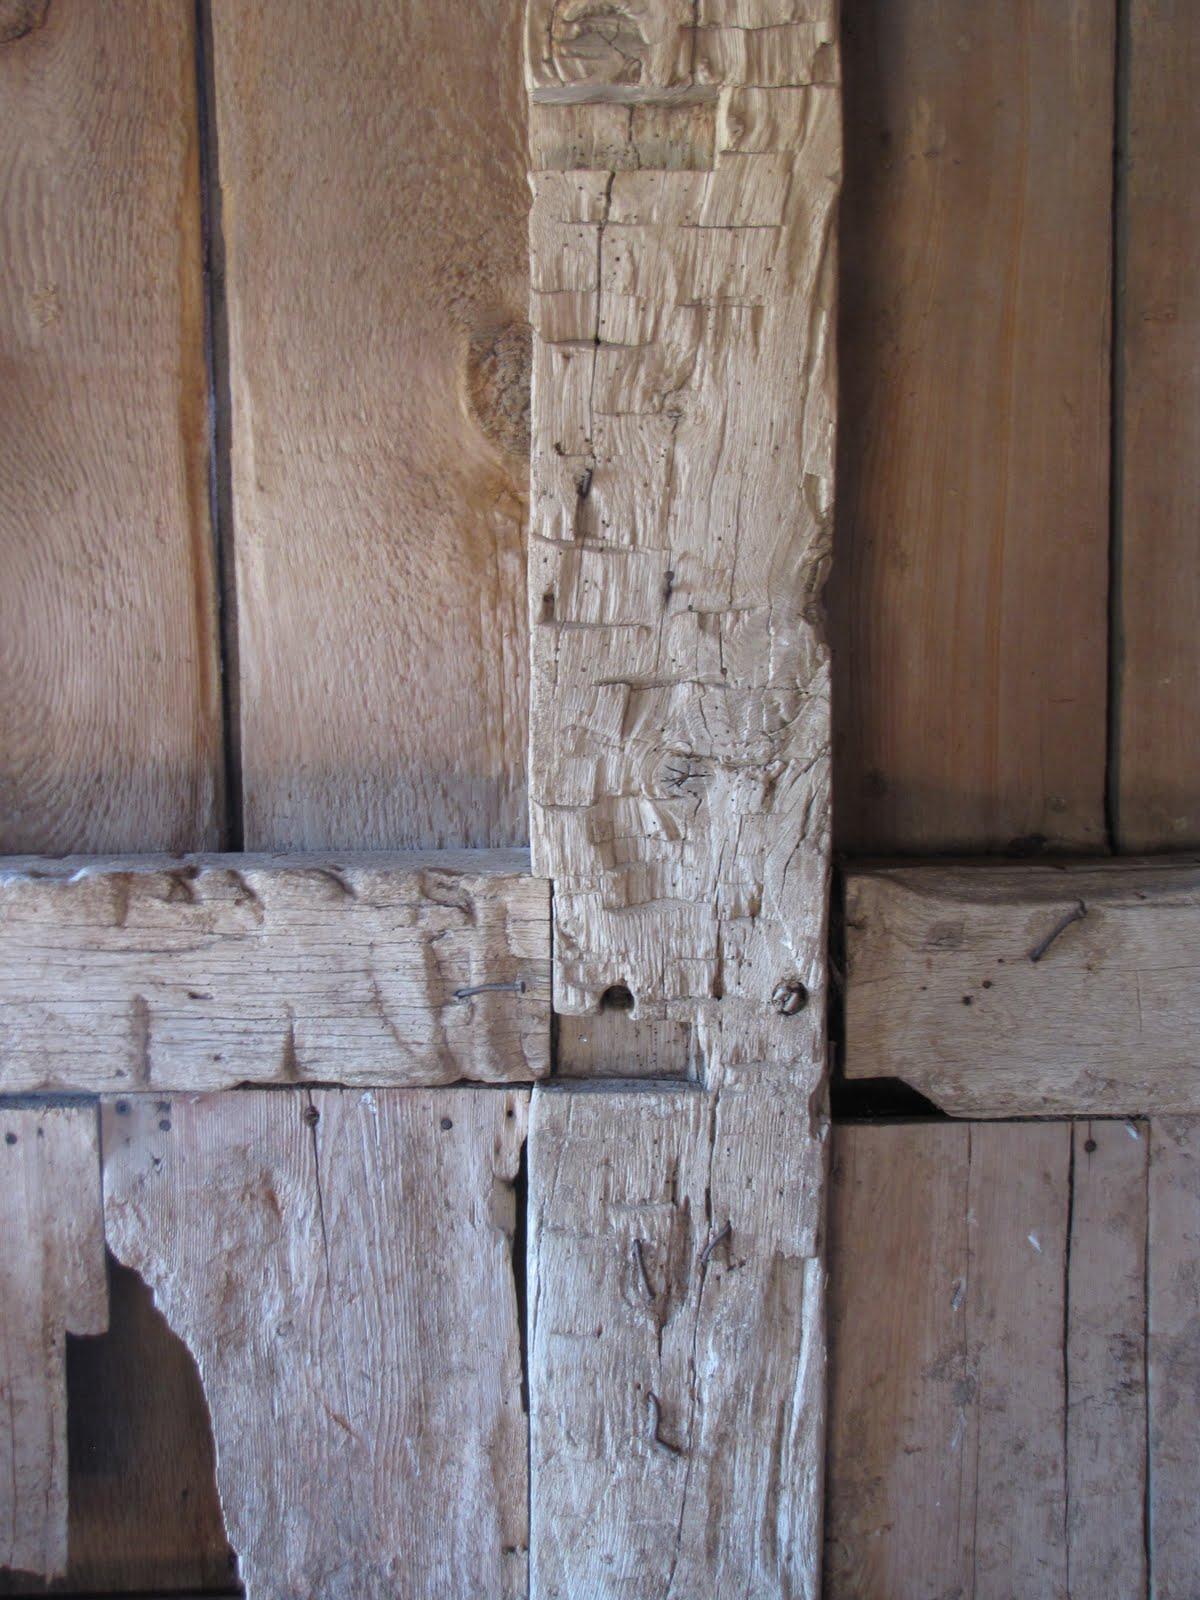 Horse Barn Plans And Prices 8x10x12x14x16x18x20x22x24 Josep